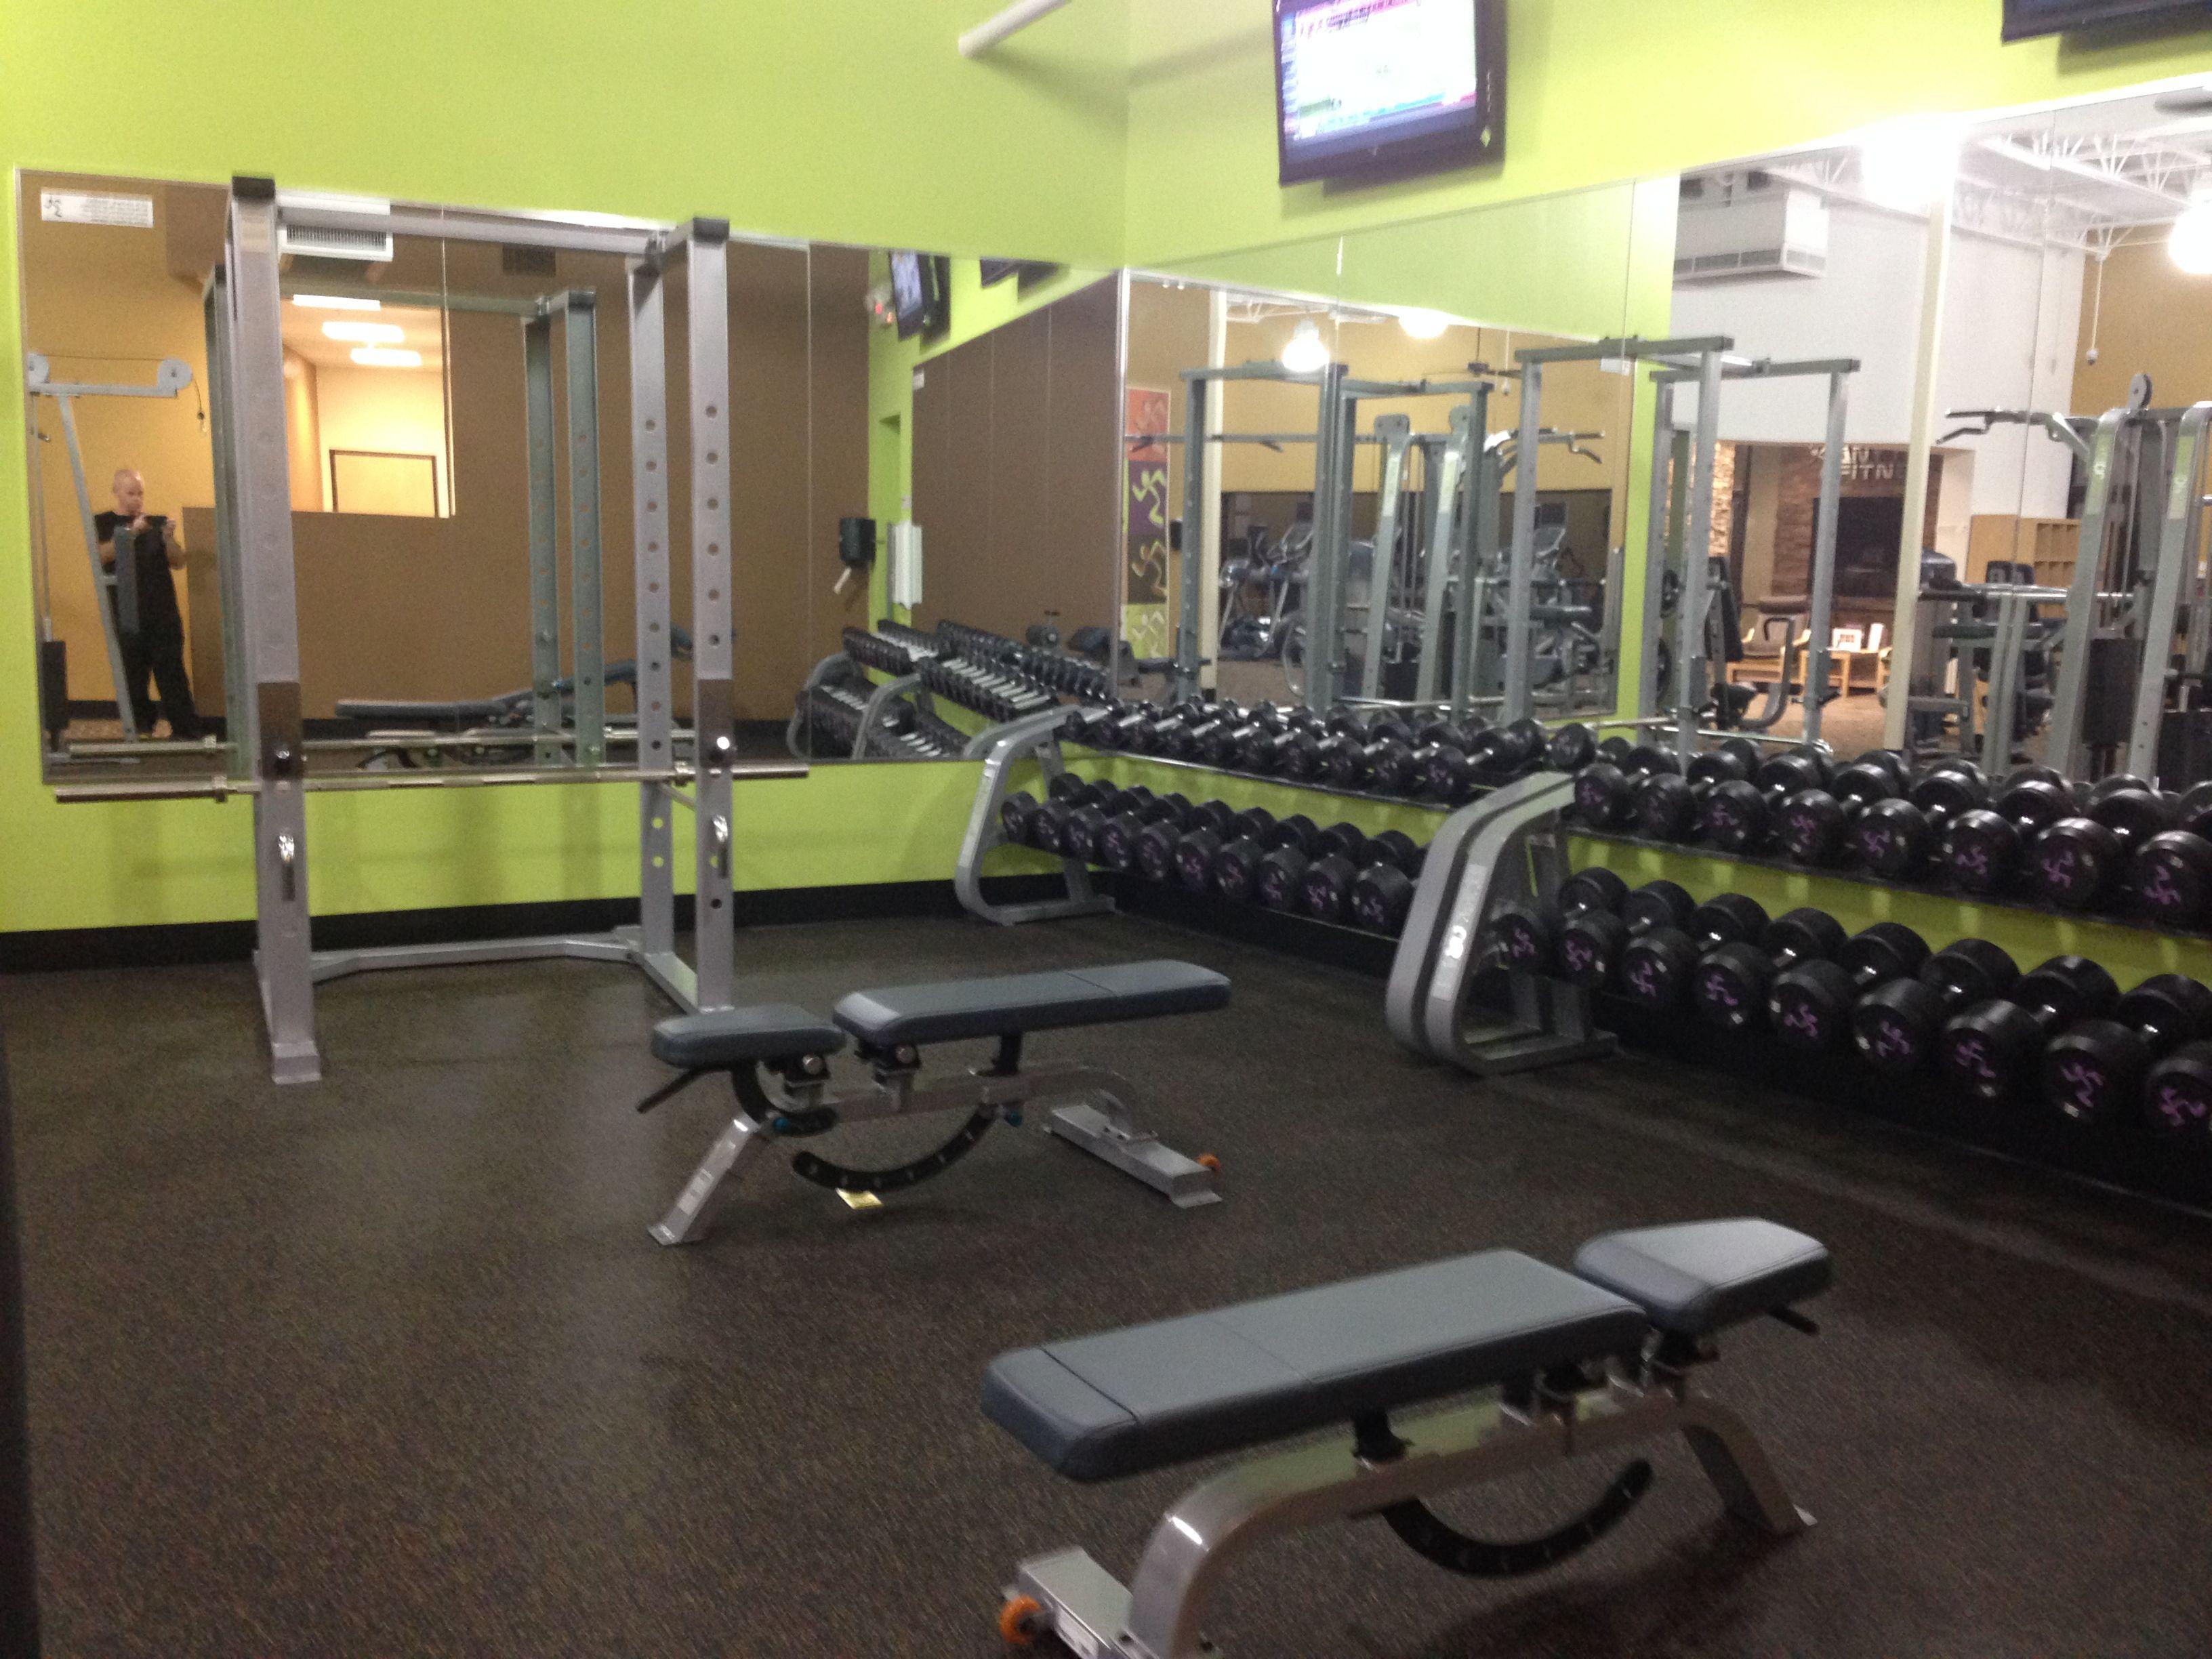 Http Anytimefitness Com Gyms 3089 Plano Tx 75074 Anytime Fitness Gym Plano